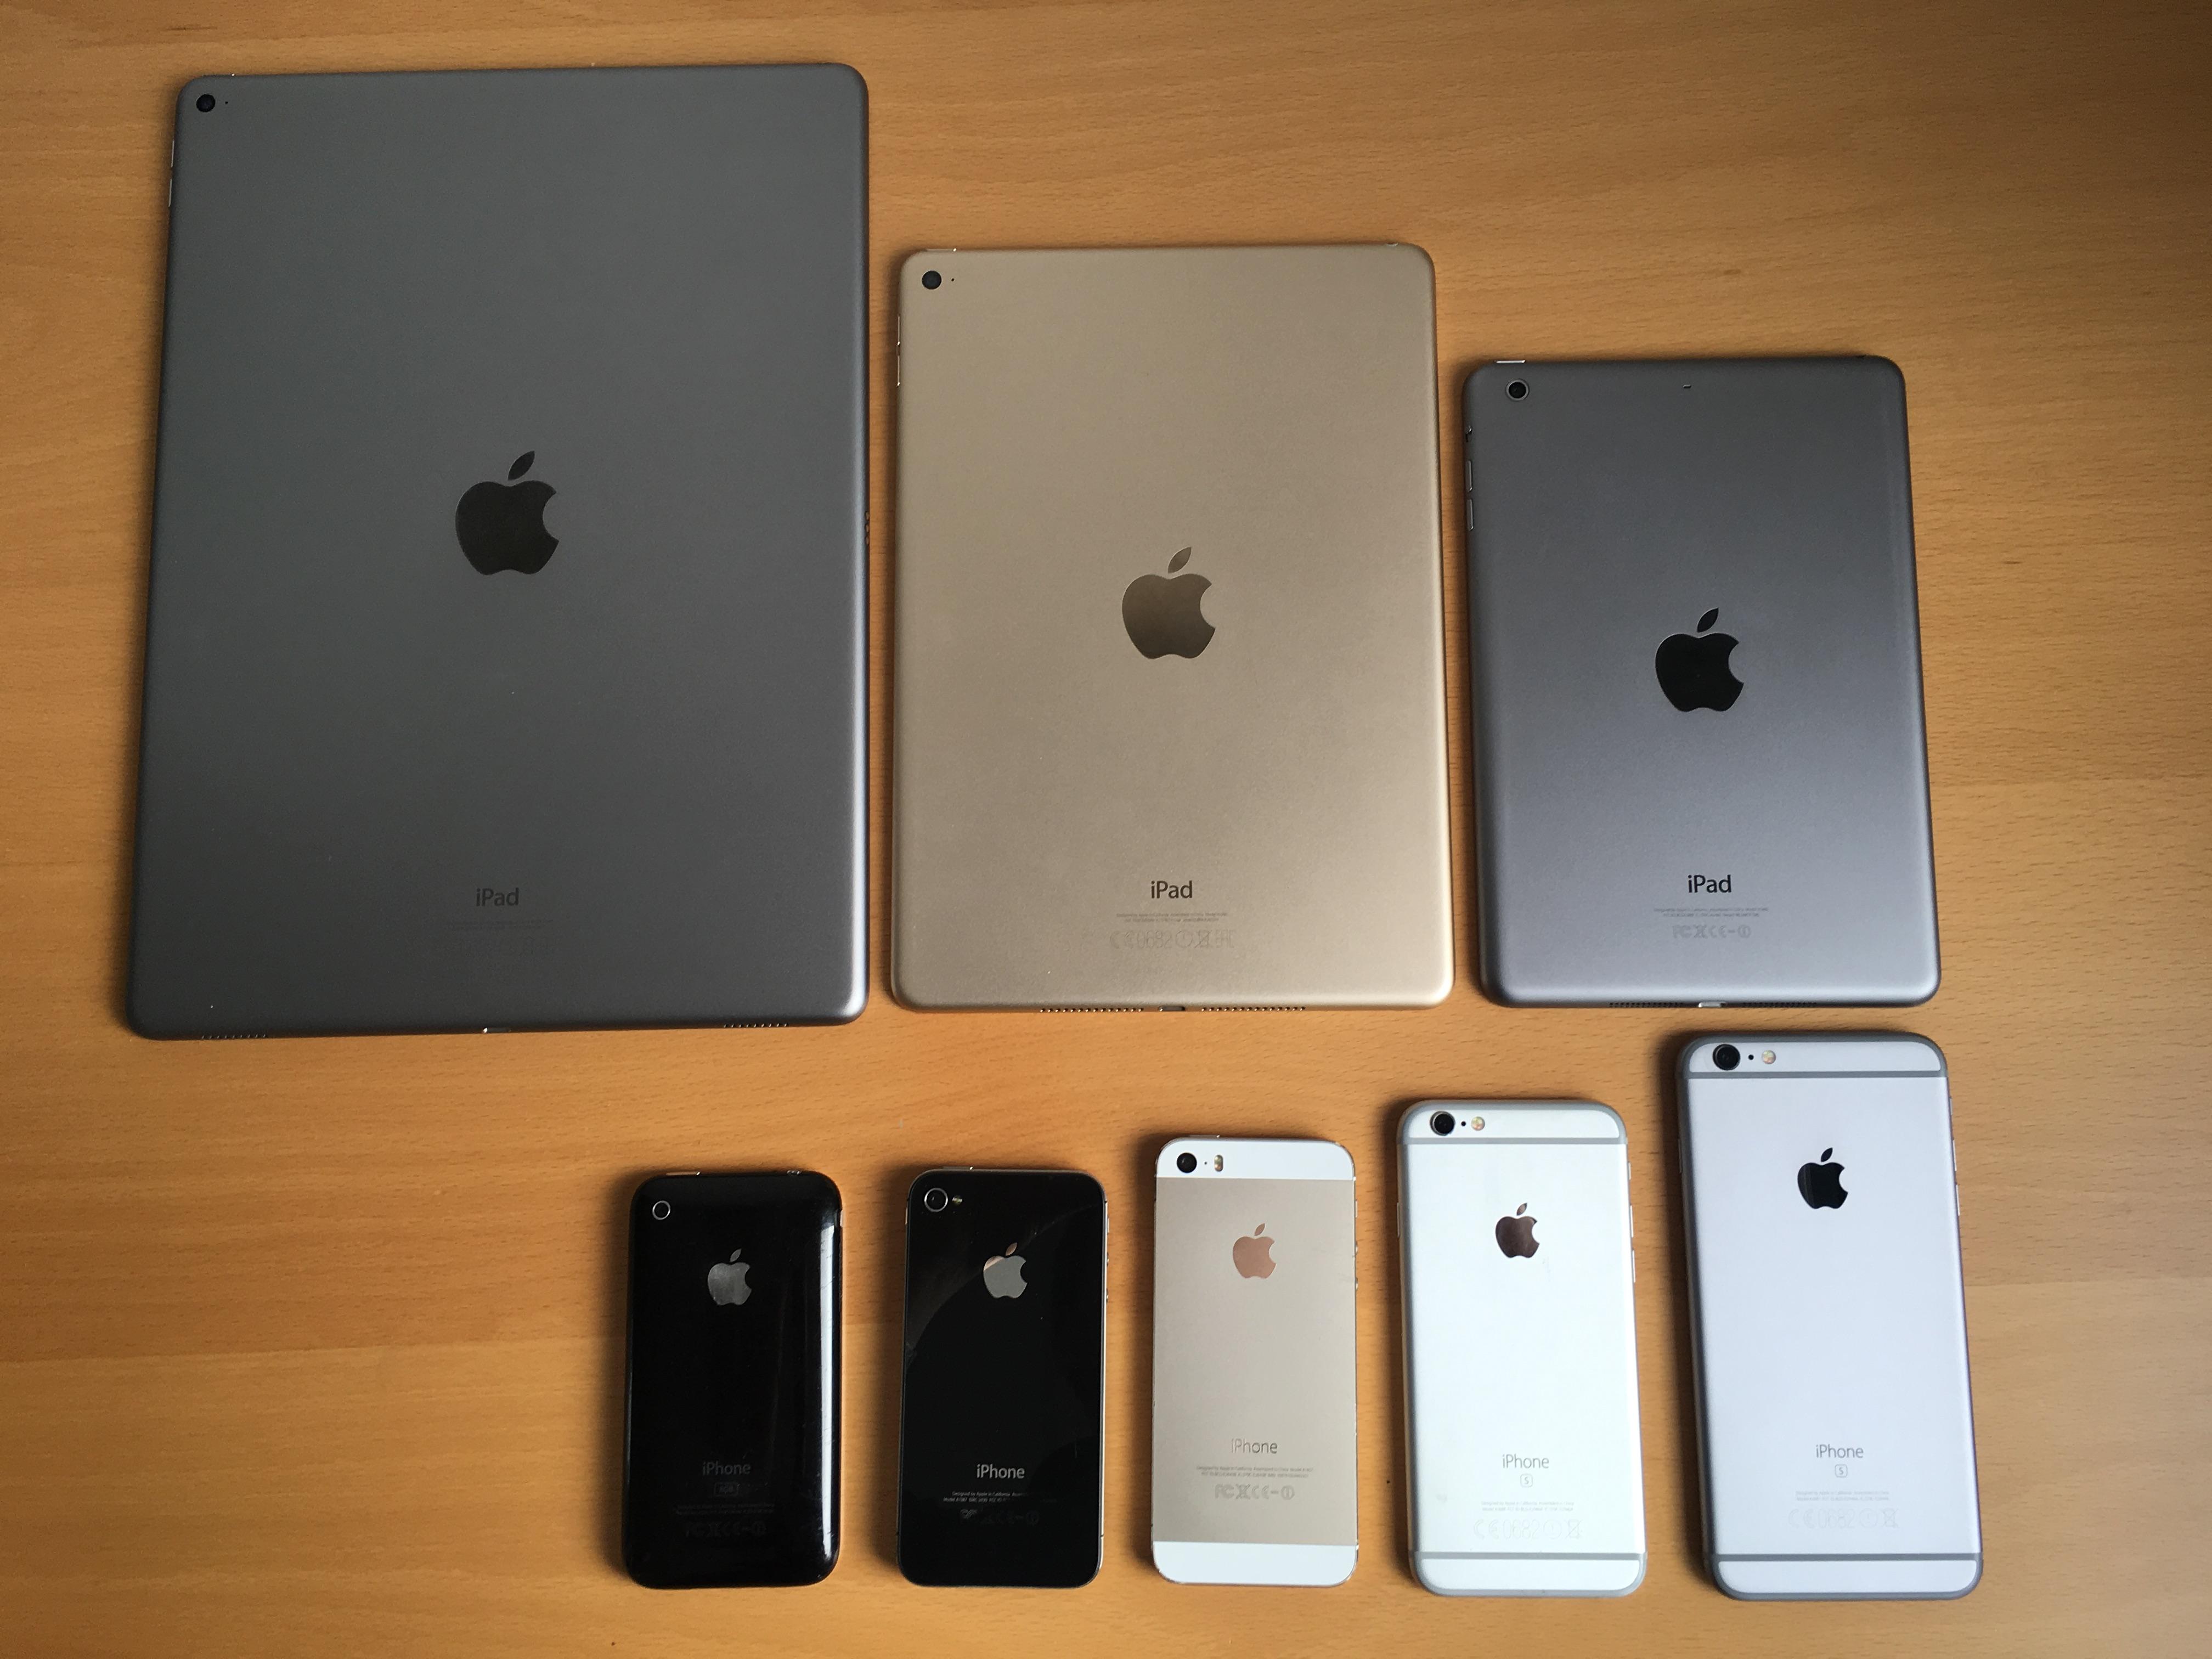 Thefoneshop - Official Apple iPhone, unlock Service